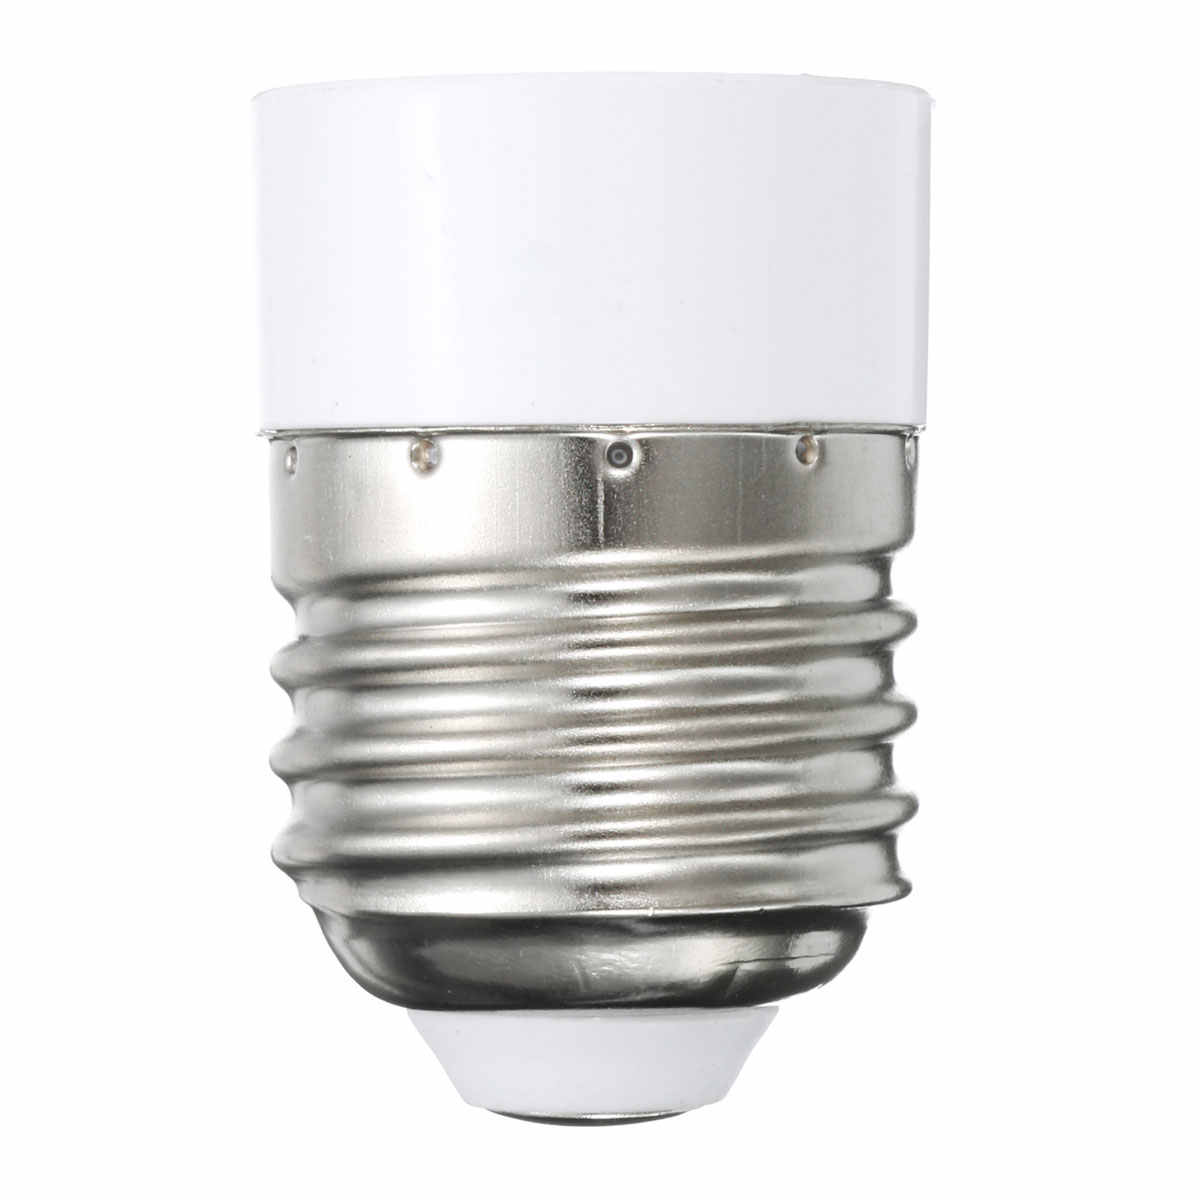 Jiguoor PC + Koper Materiaal E27 om E14 lamphouder Converter Schroef Socket Conversie gloeilamp Base type Adapter